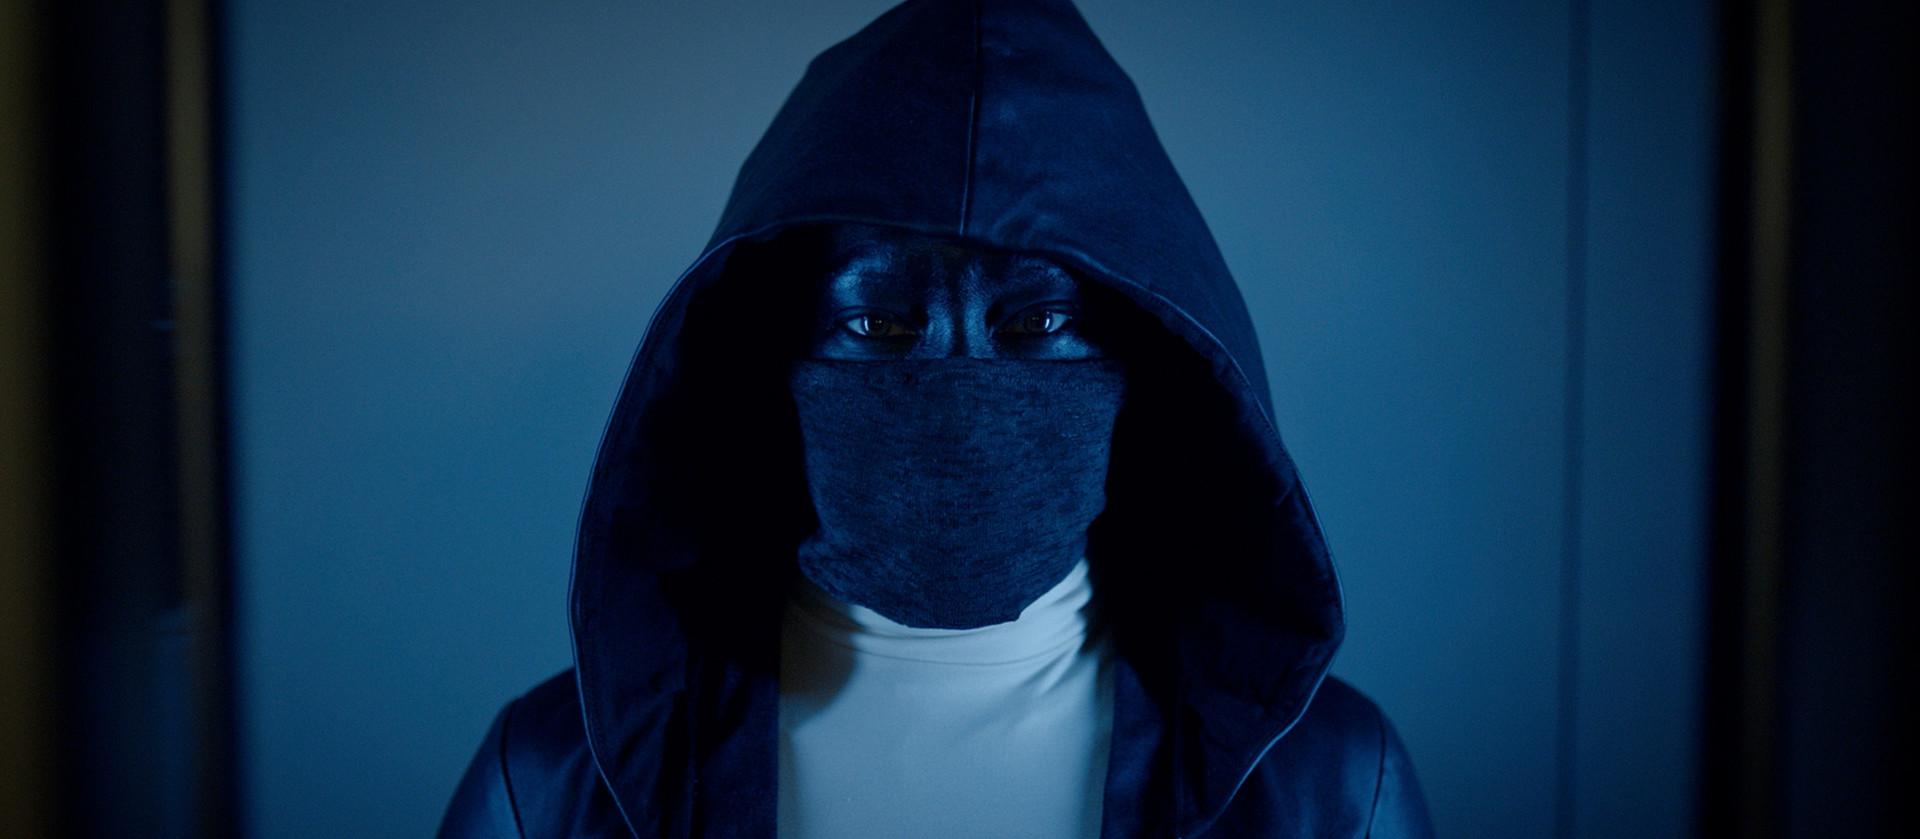 Watchmen, Season 1